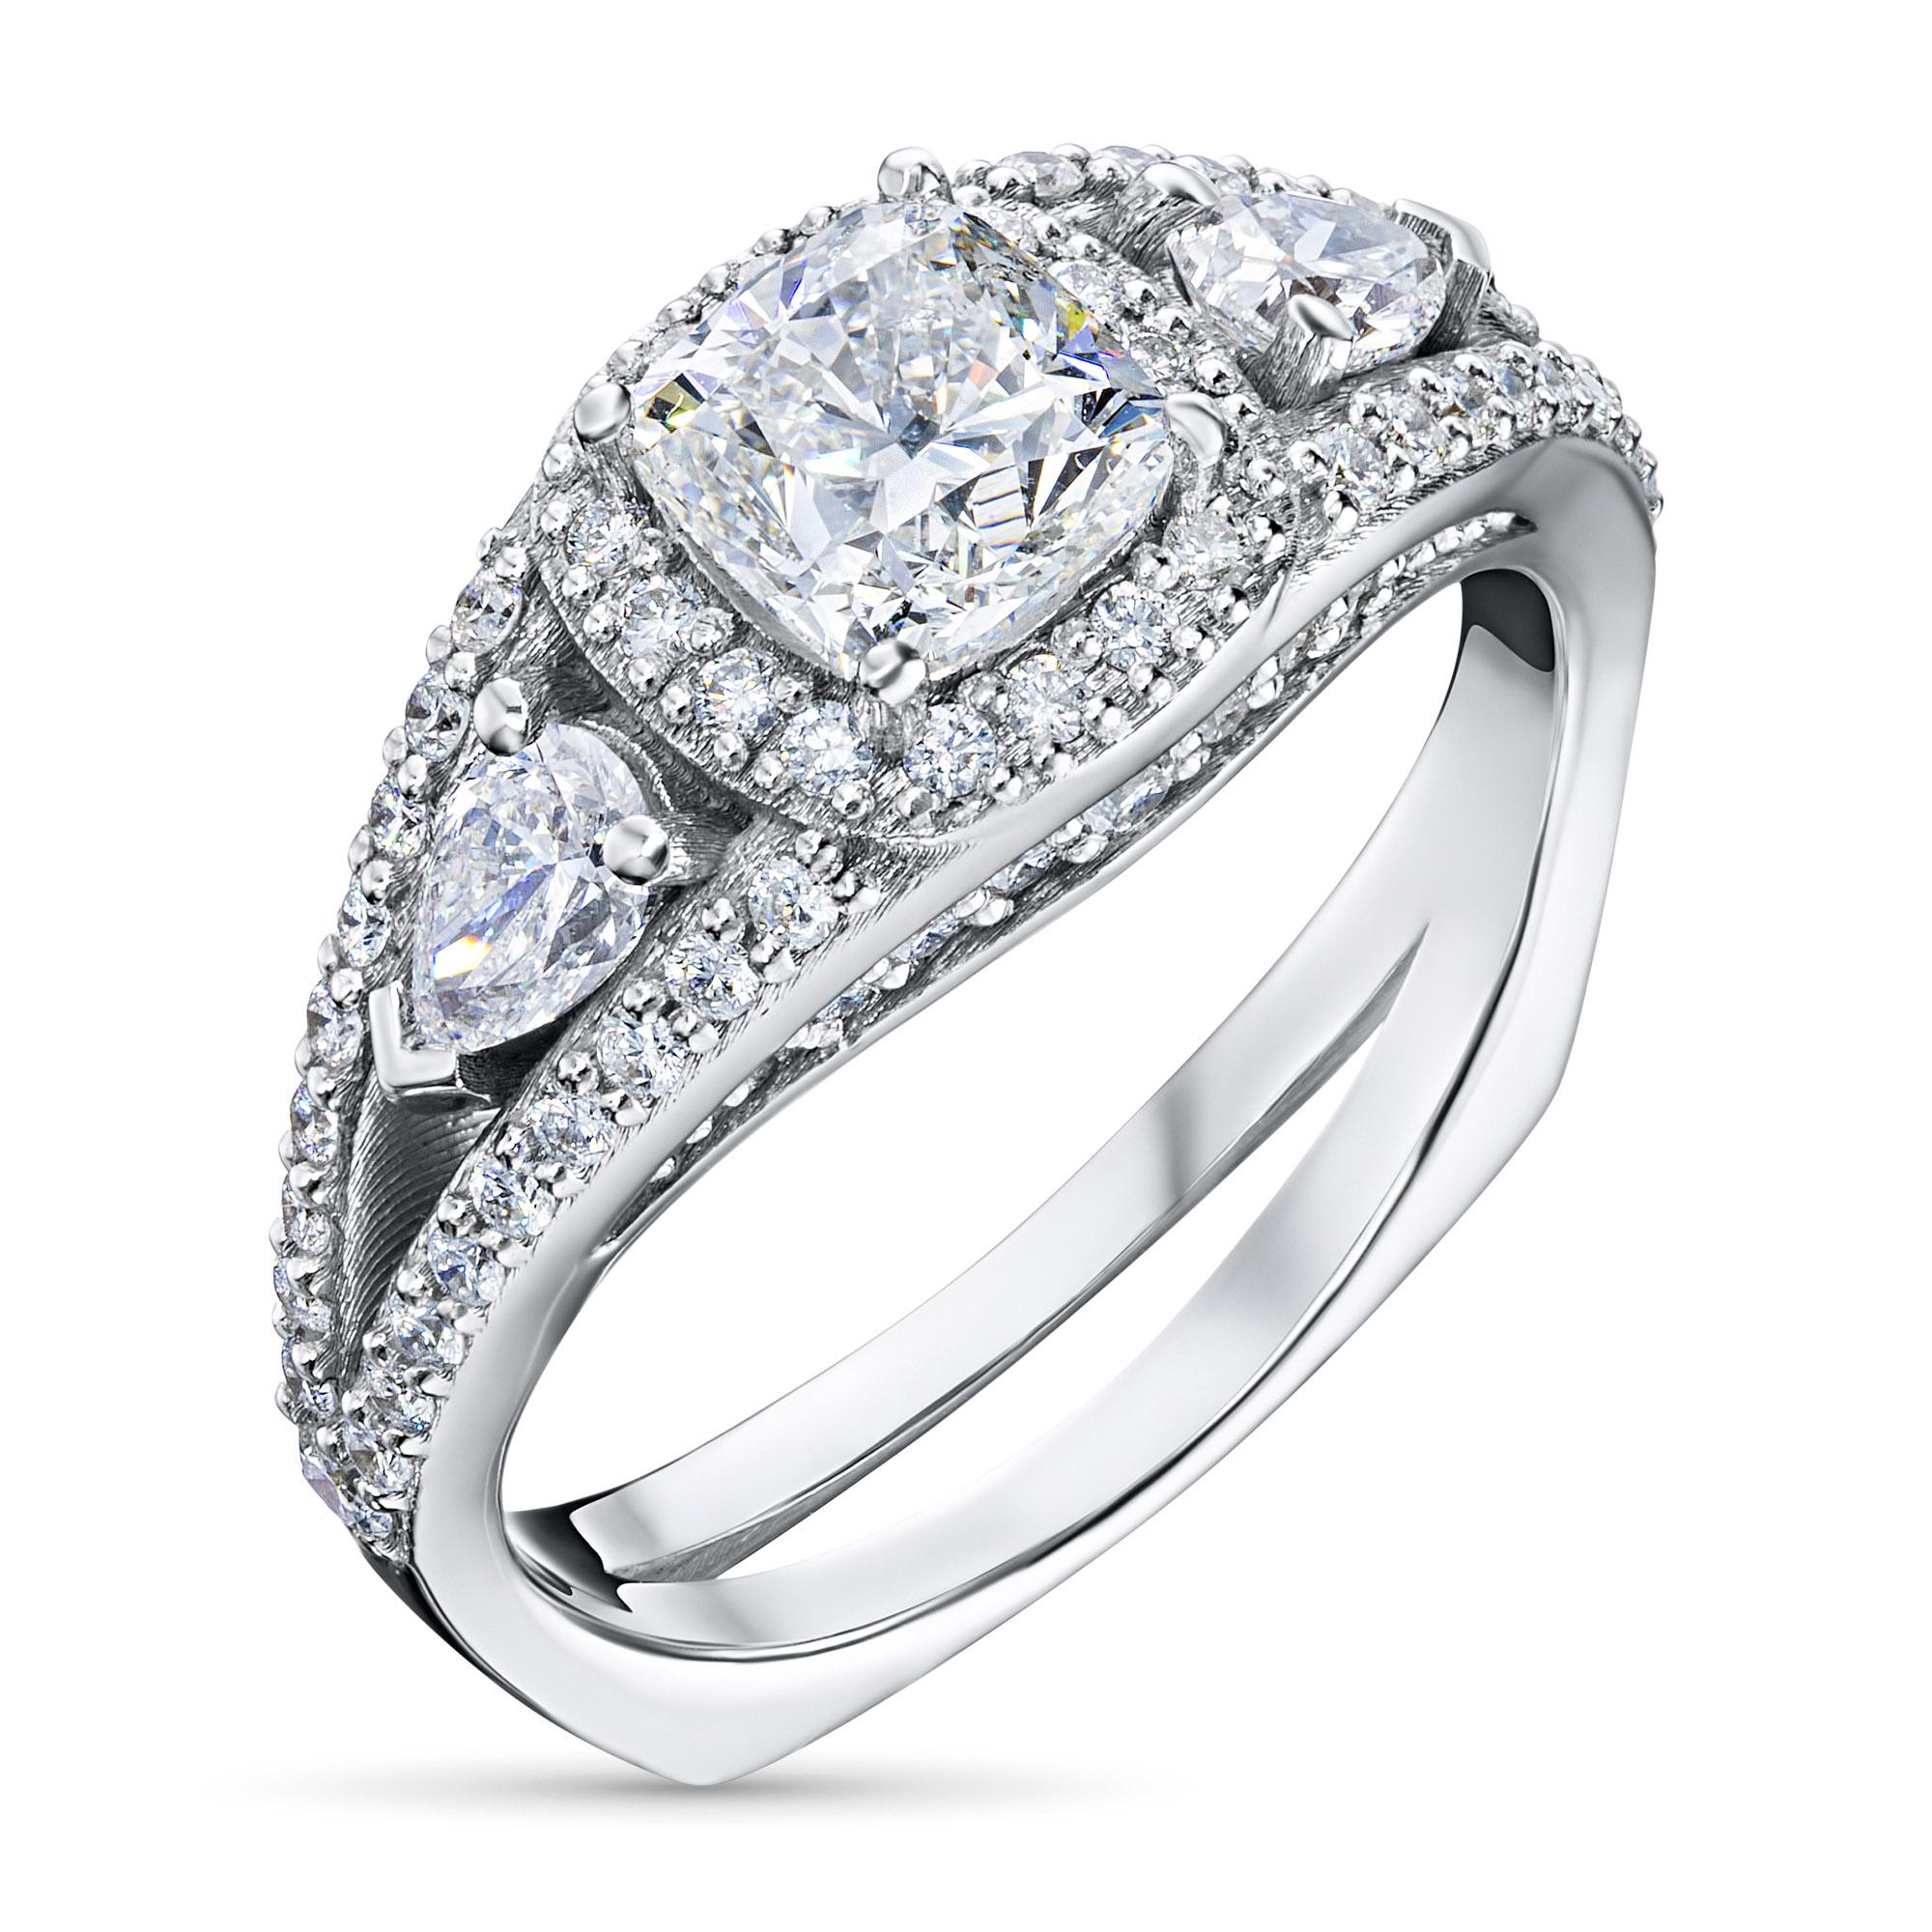 Кольцо из белого золота с бриллиантами э0901кц04210606